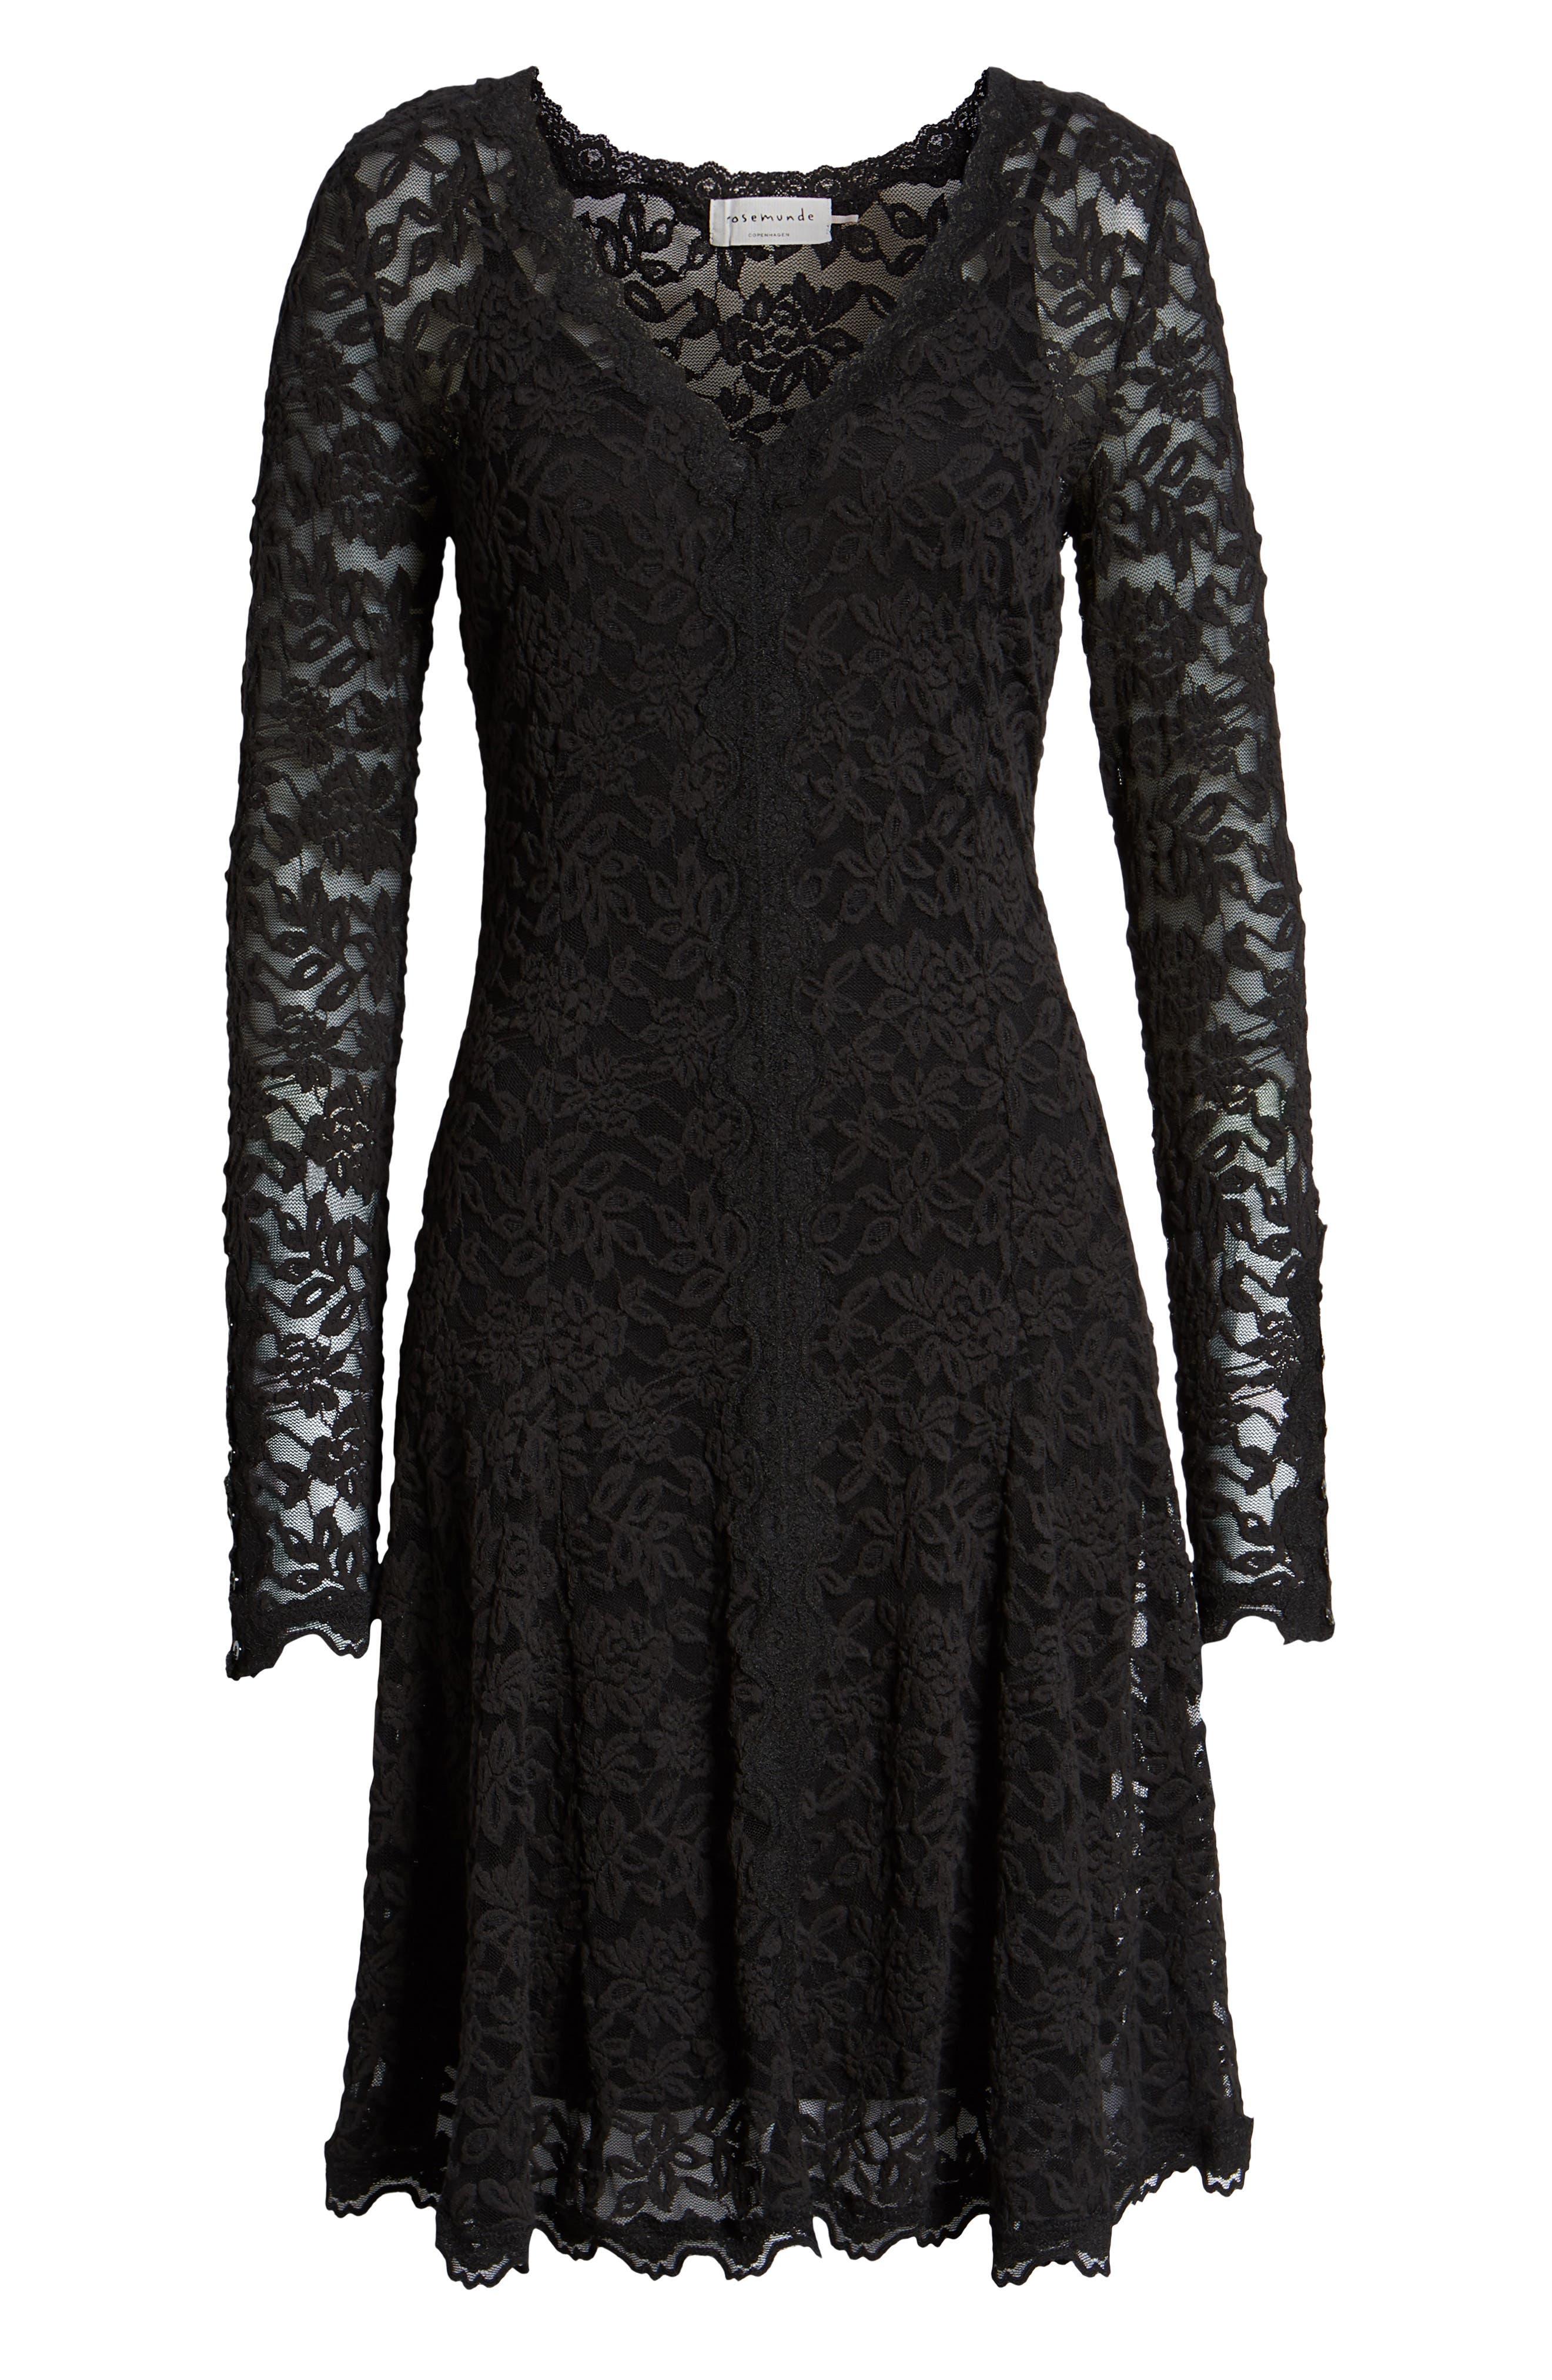 Delicia Fit & Flare Lace Dress,                             Alternate thumbnail 7, color,                             BLACK